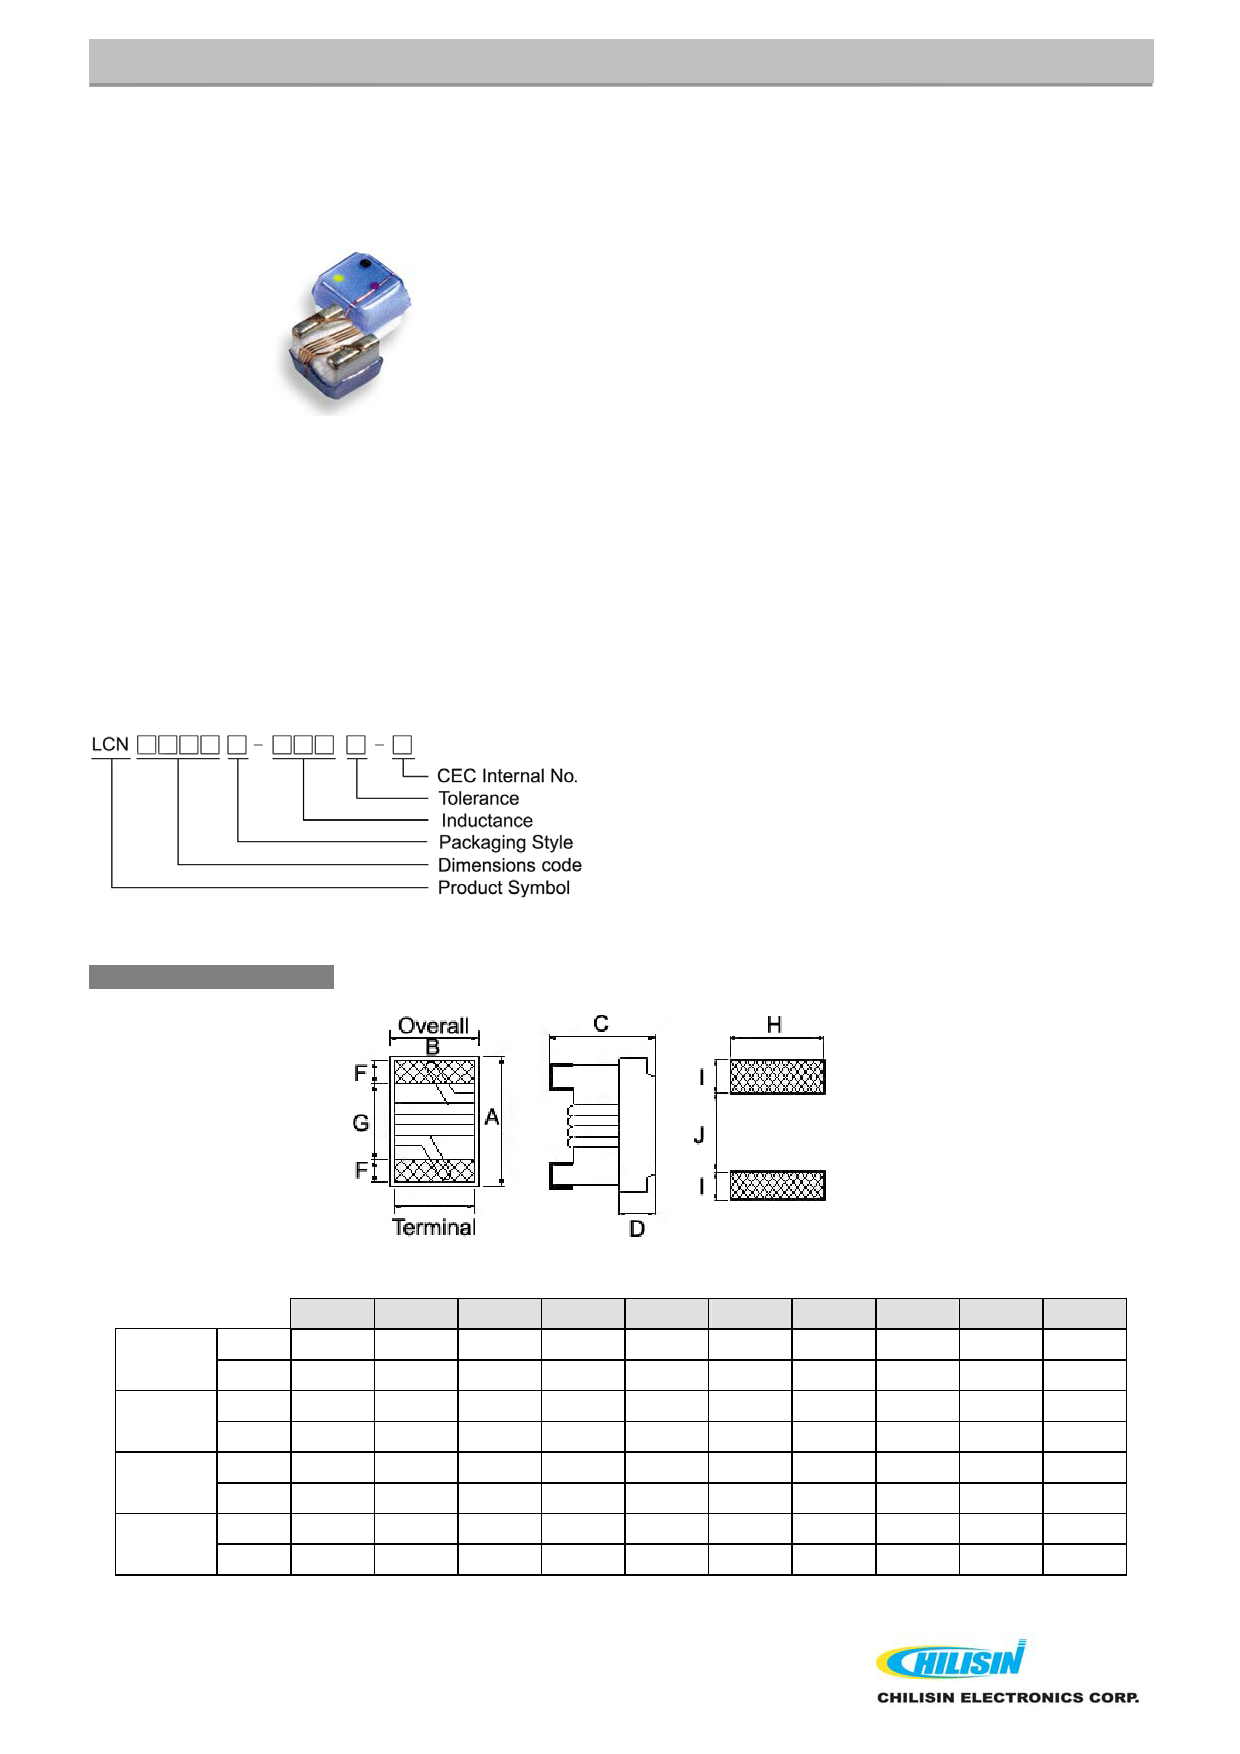 LCN1008 데이터시트 및 LCN1008 PDF